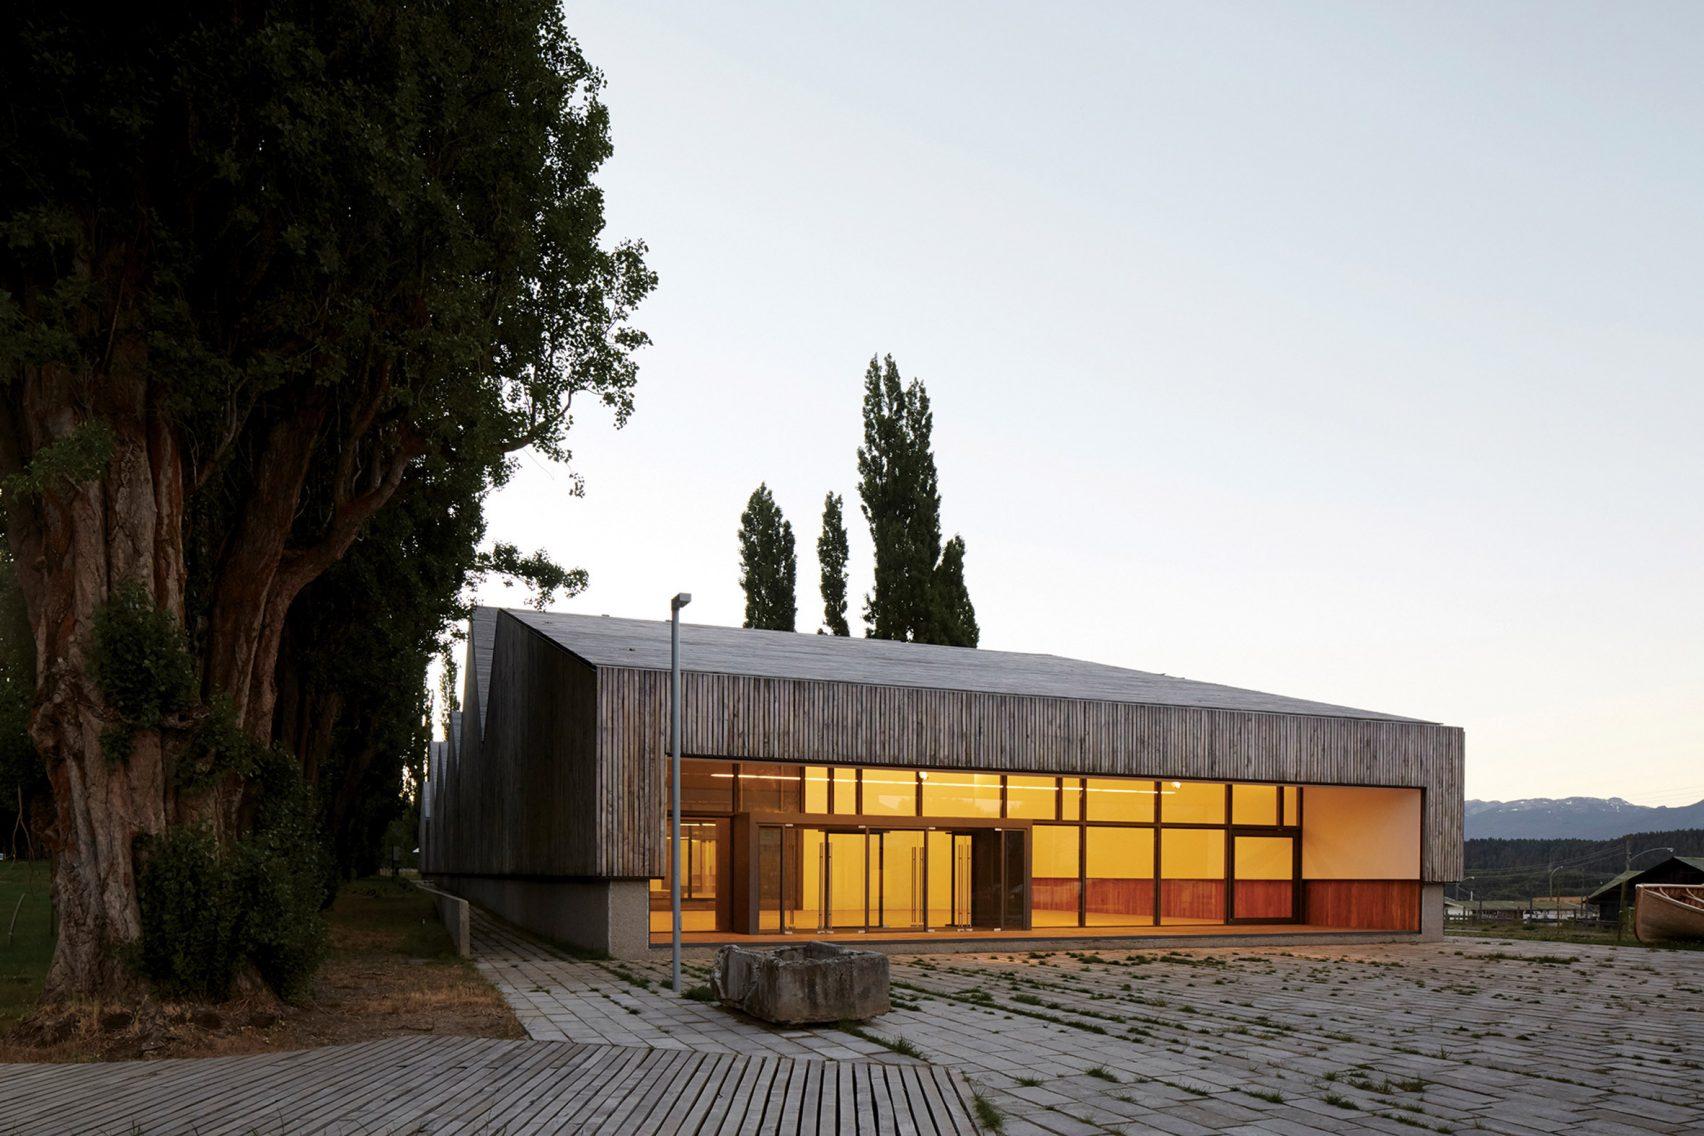 museo-regional-aysen-bbats-tirado-arquitectos-cristobal-palma-03